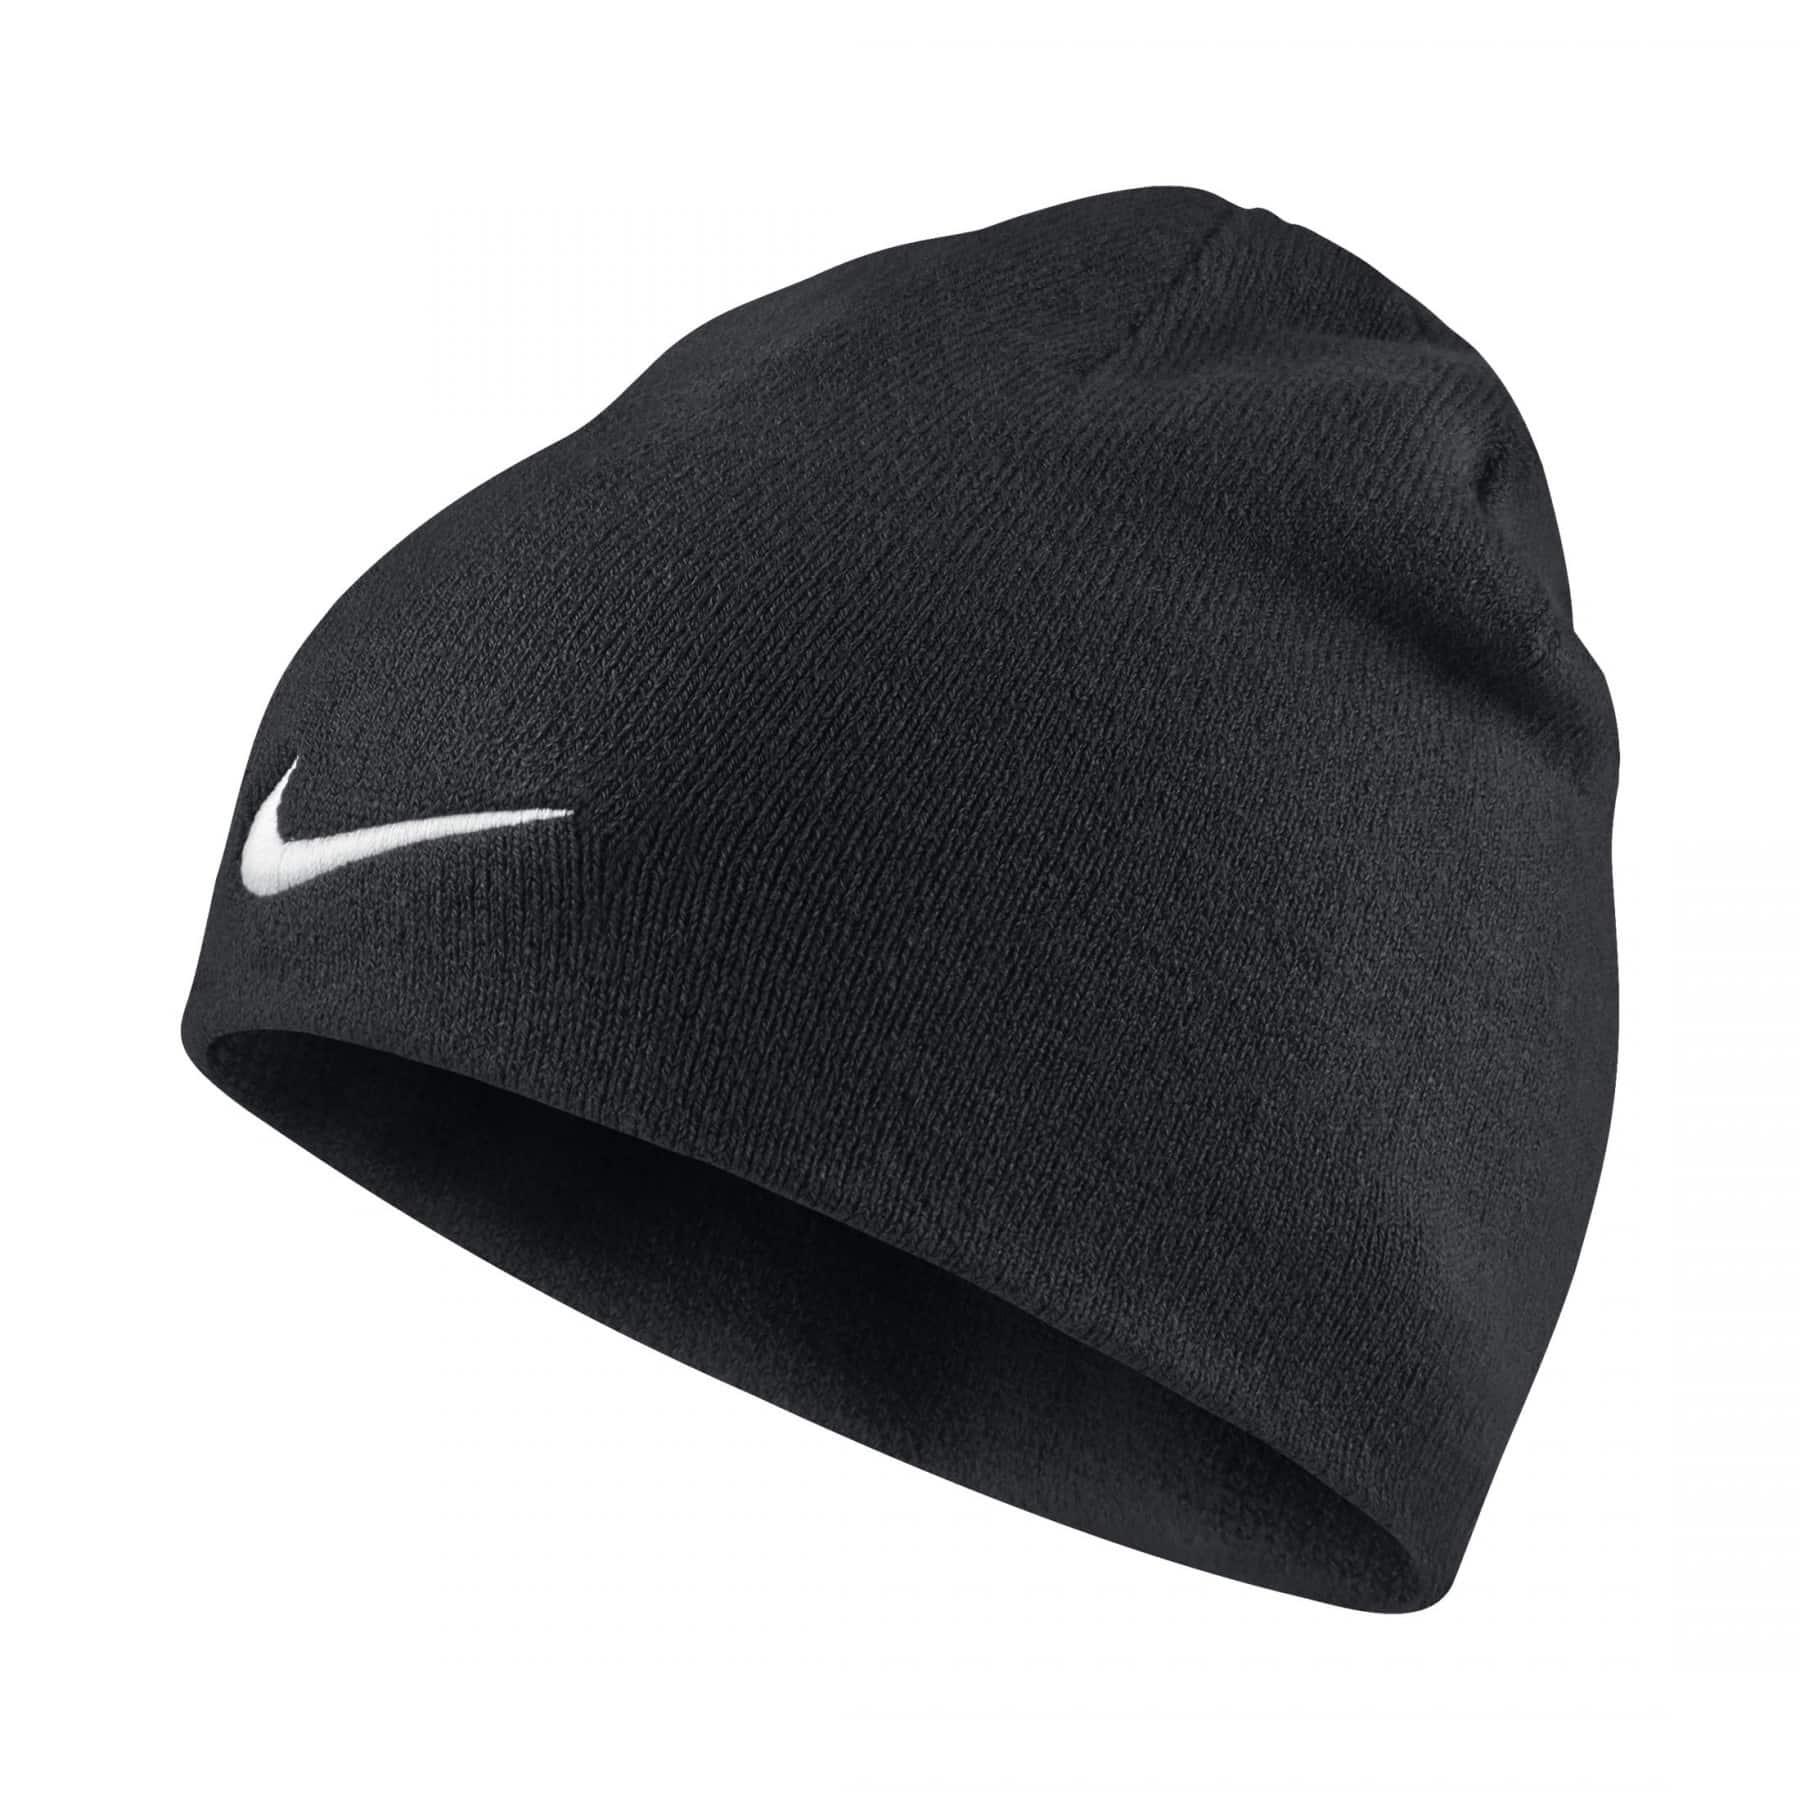 bonnet nike _646406-010 marine